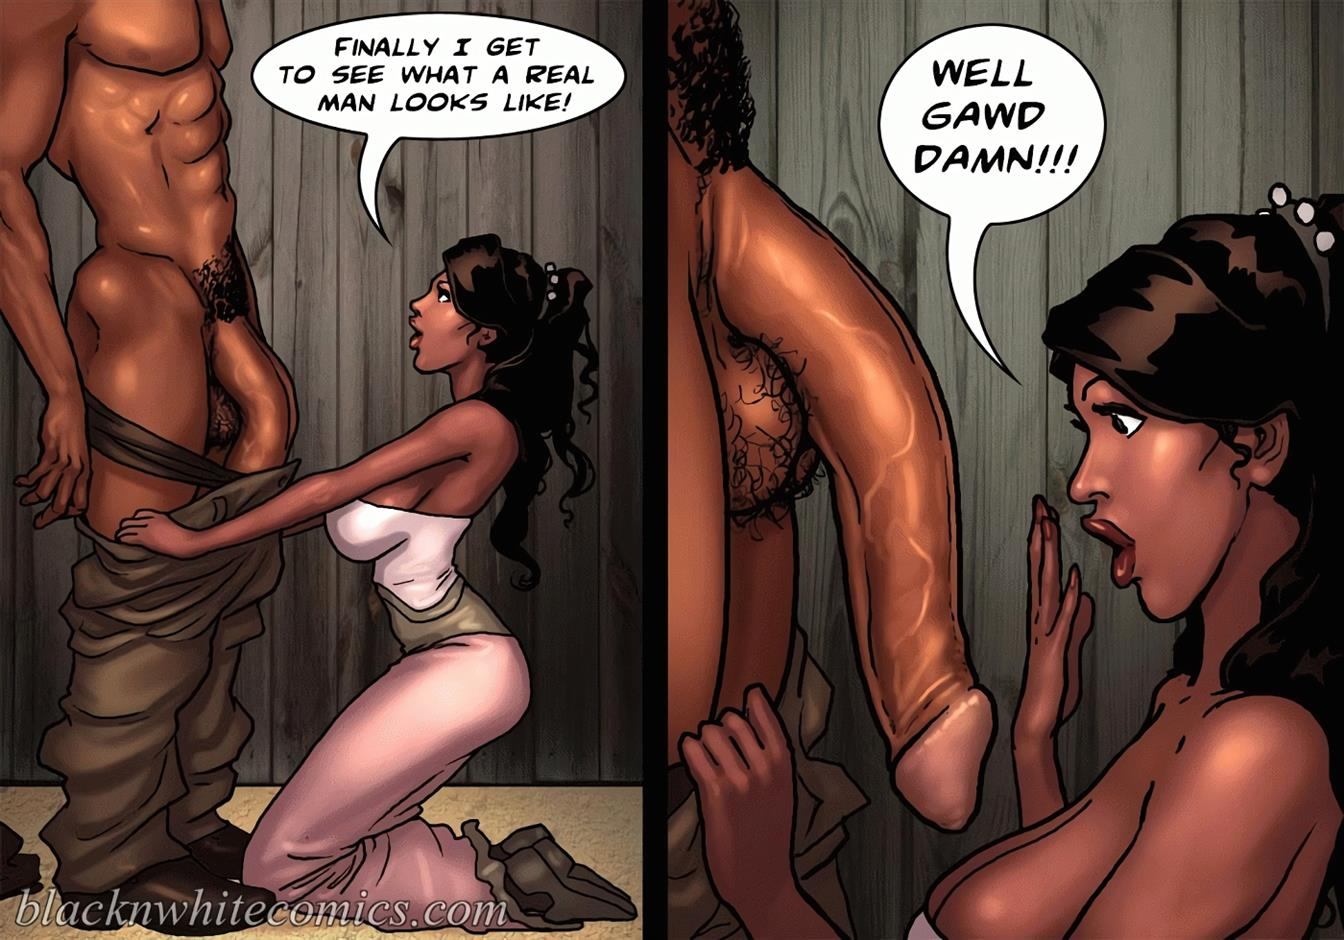 True Dick [BlackNwhite] - Foto 96